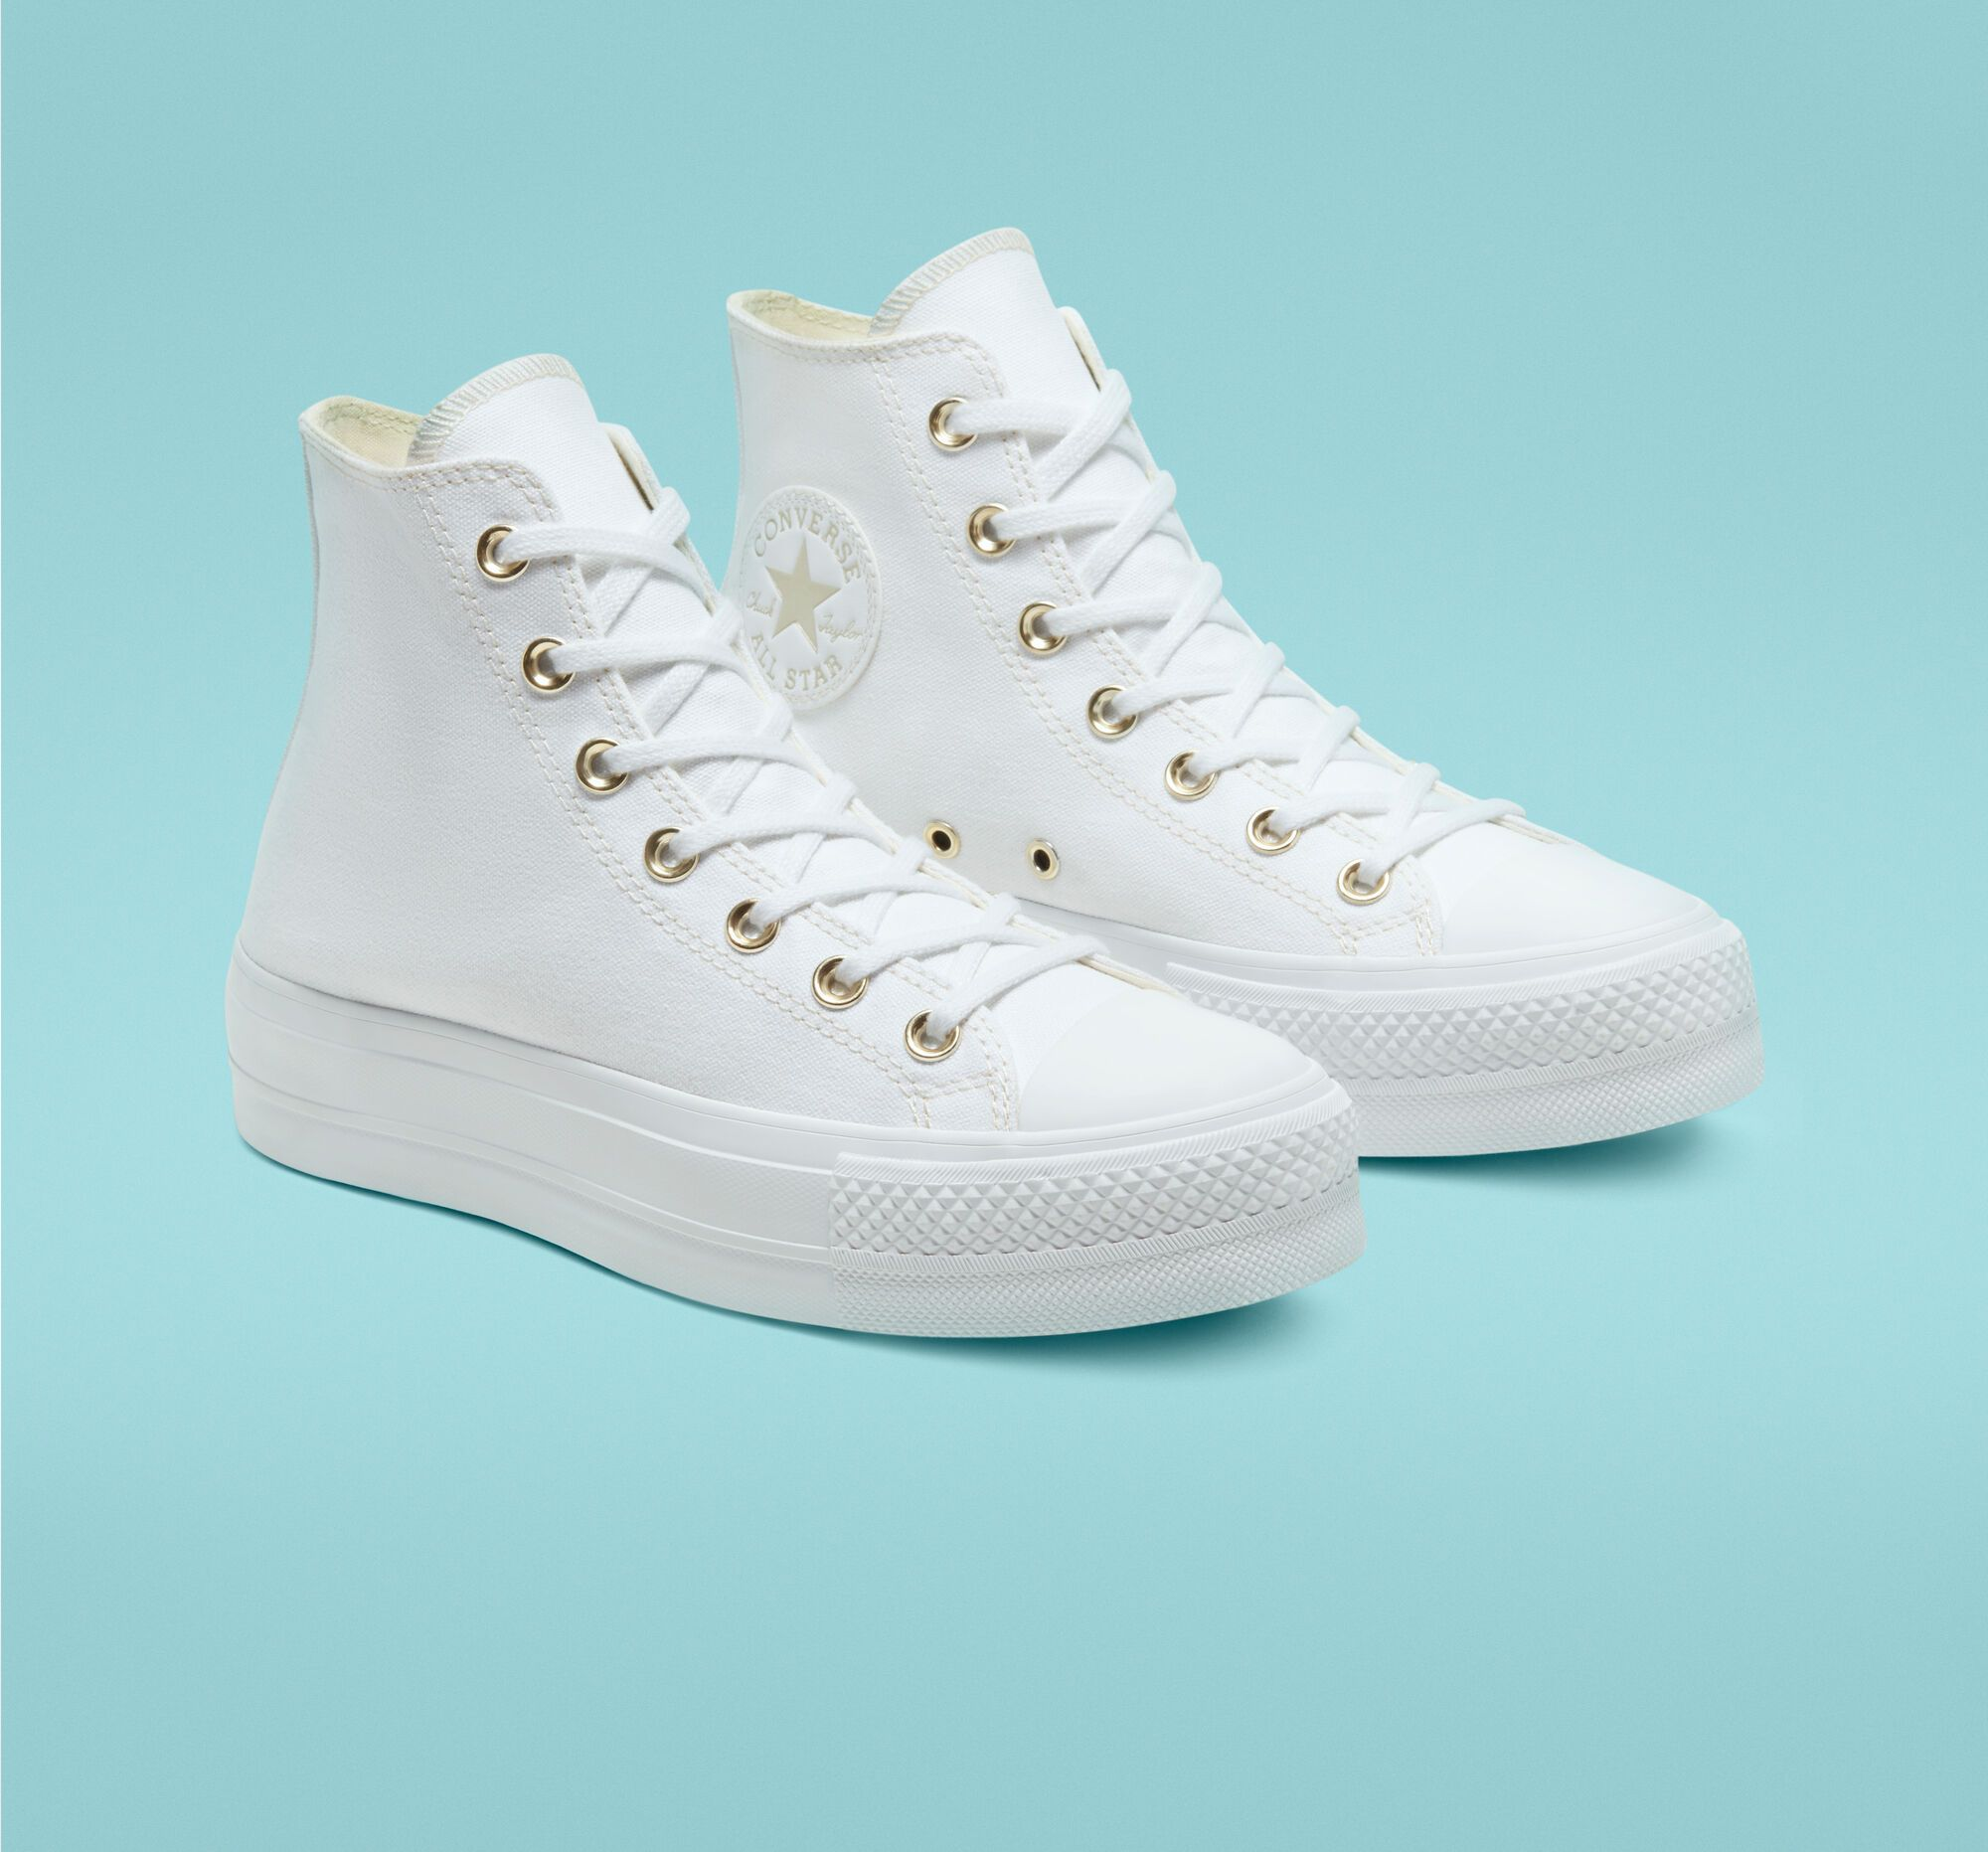 converse chuck taylor platform white